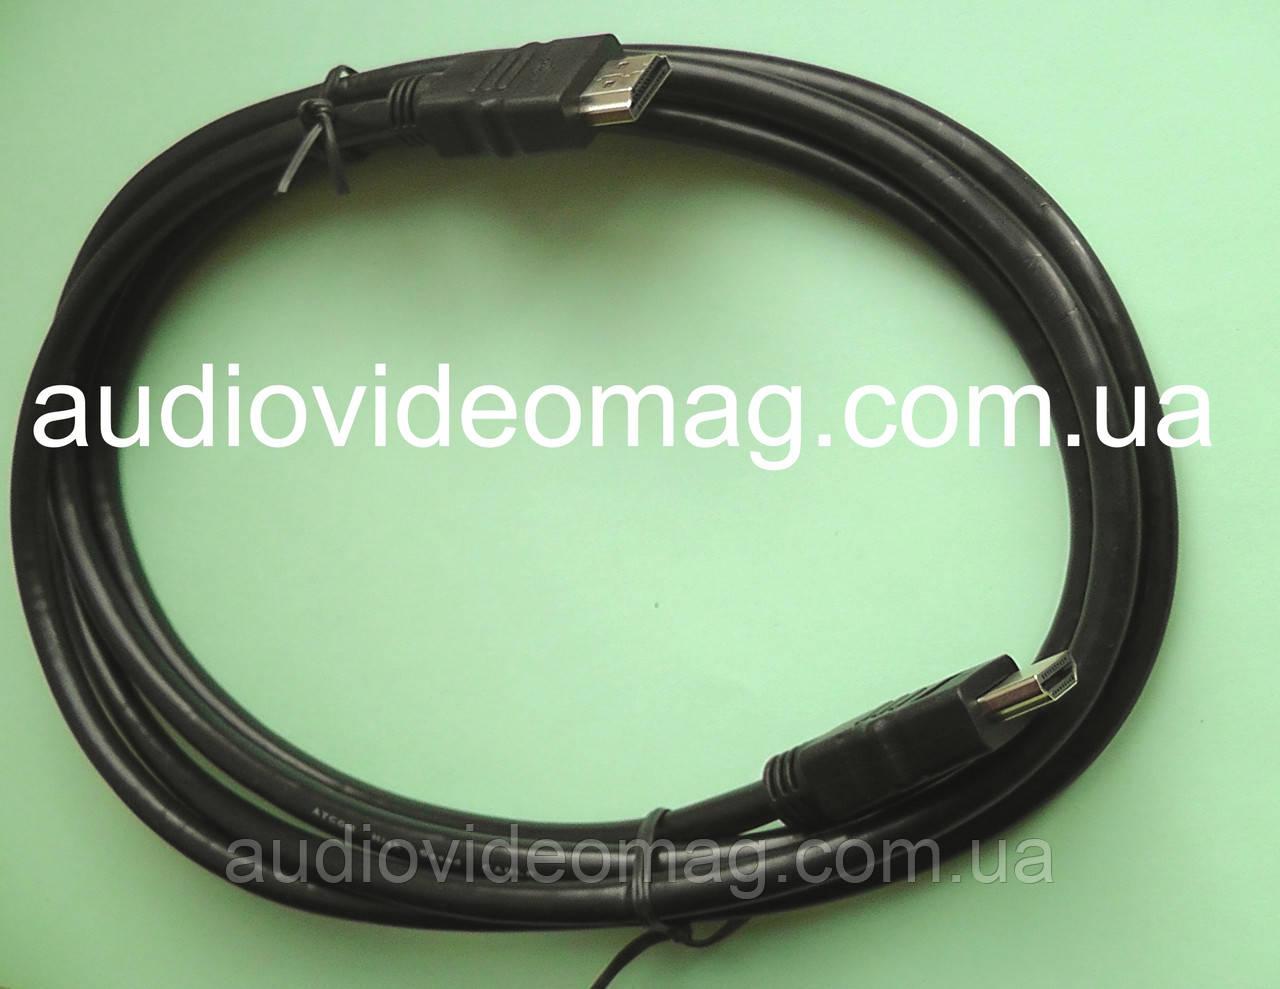 Кабель HDMI - HDMI, длина 2 метра